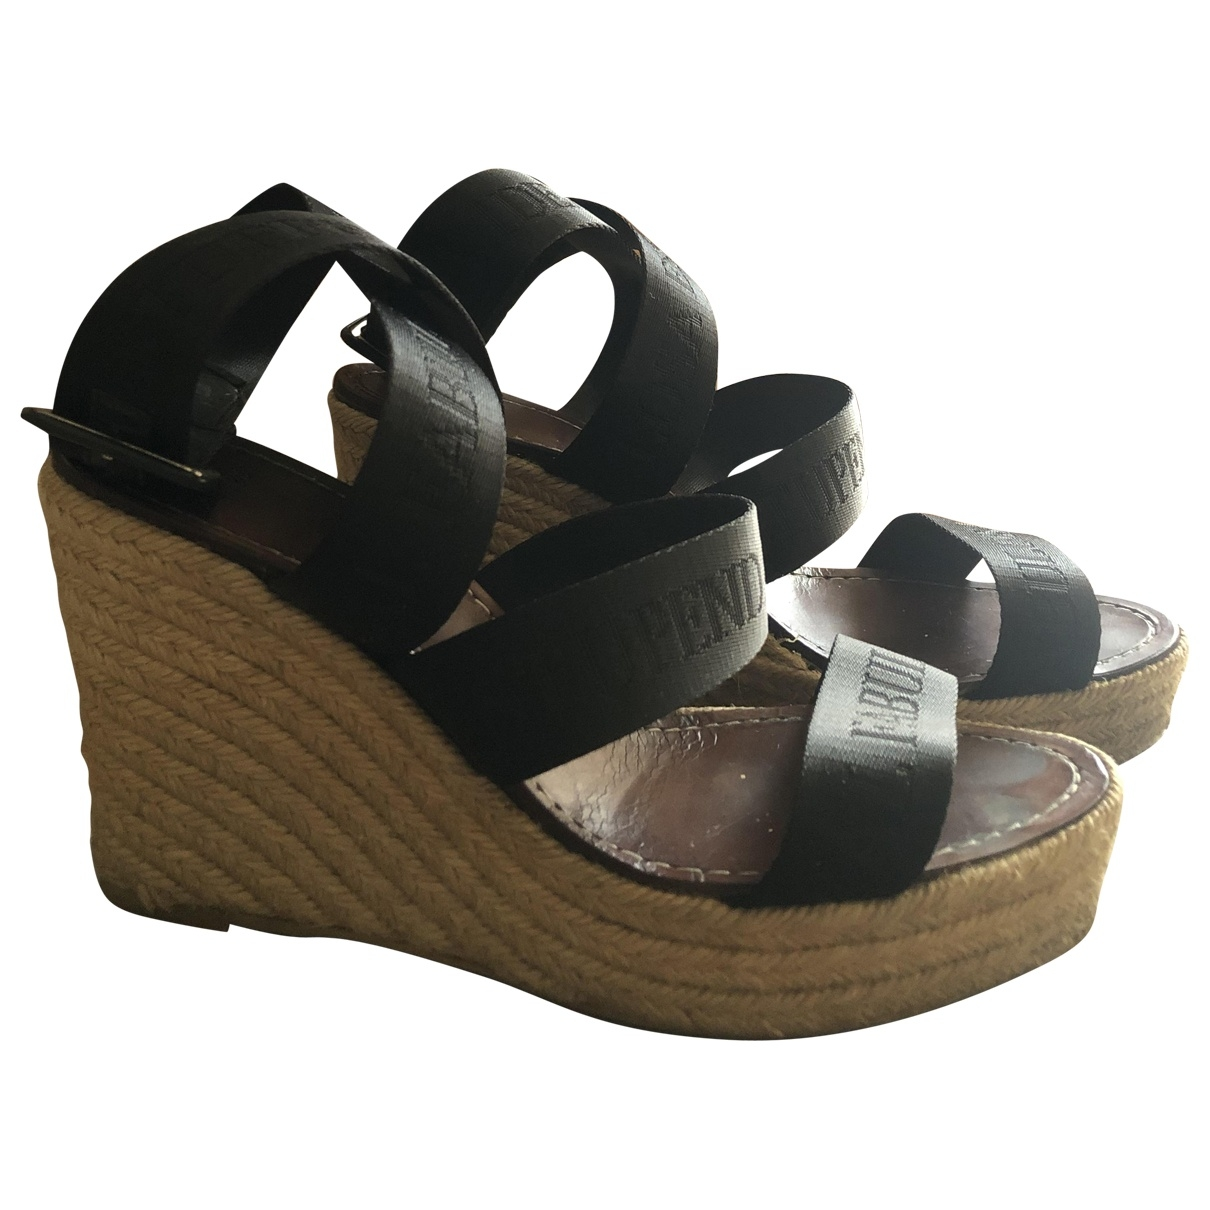 Castaner \N Black Cloth Sandals for Women 41 EU